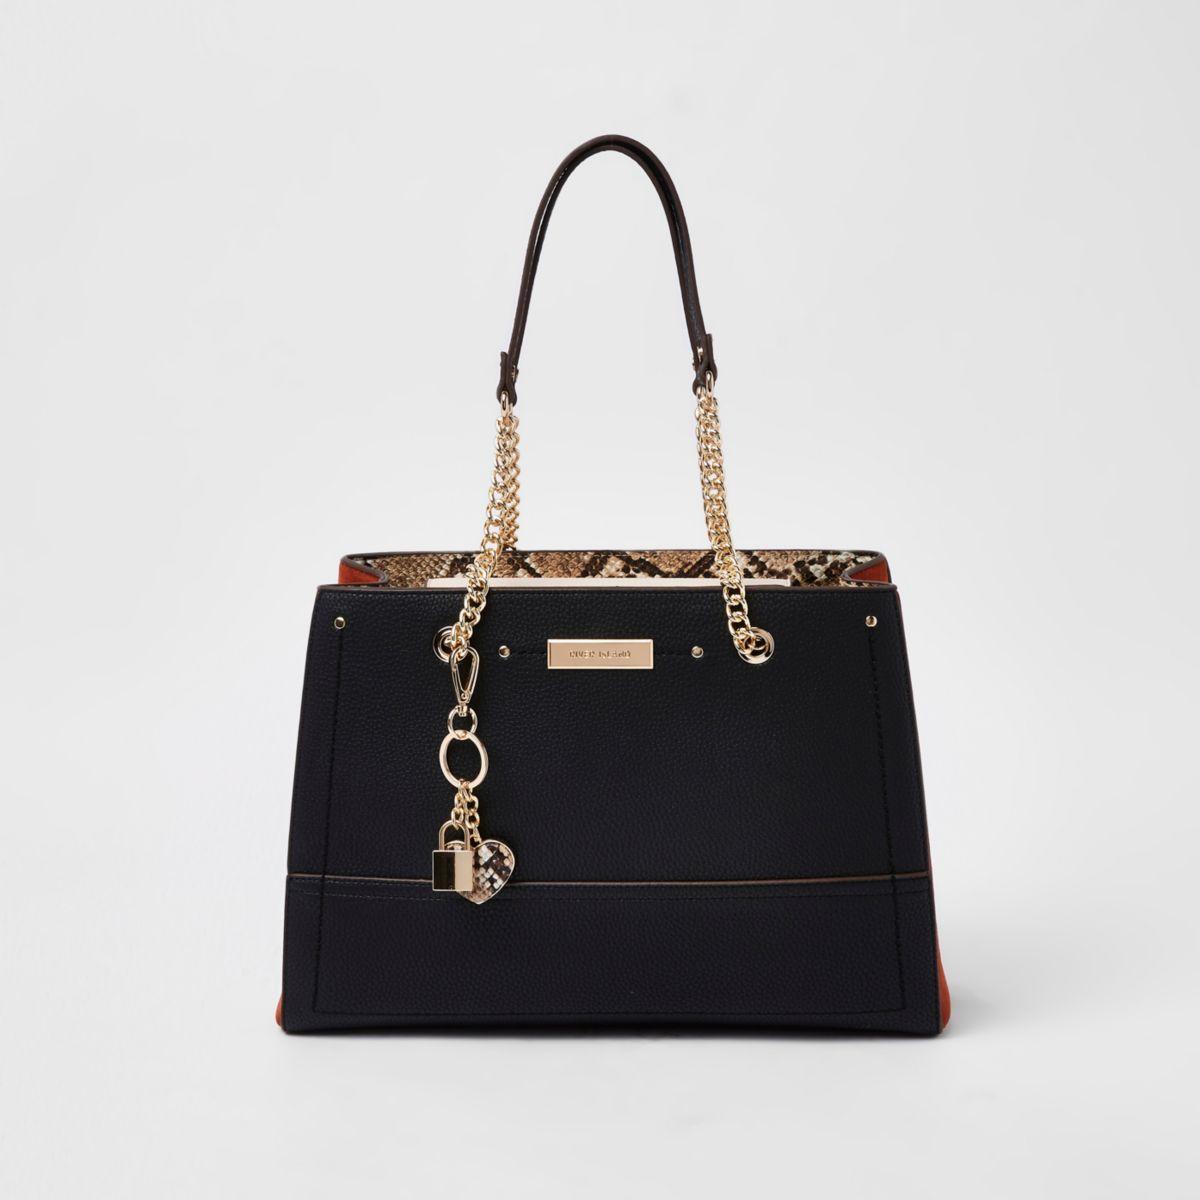 Black snake print chain handle tote bag